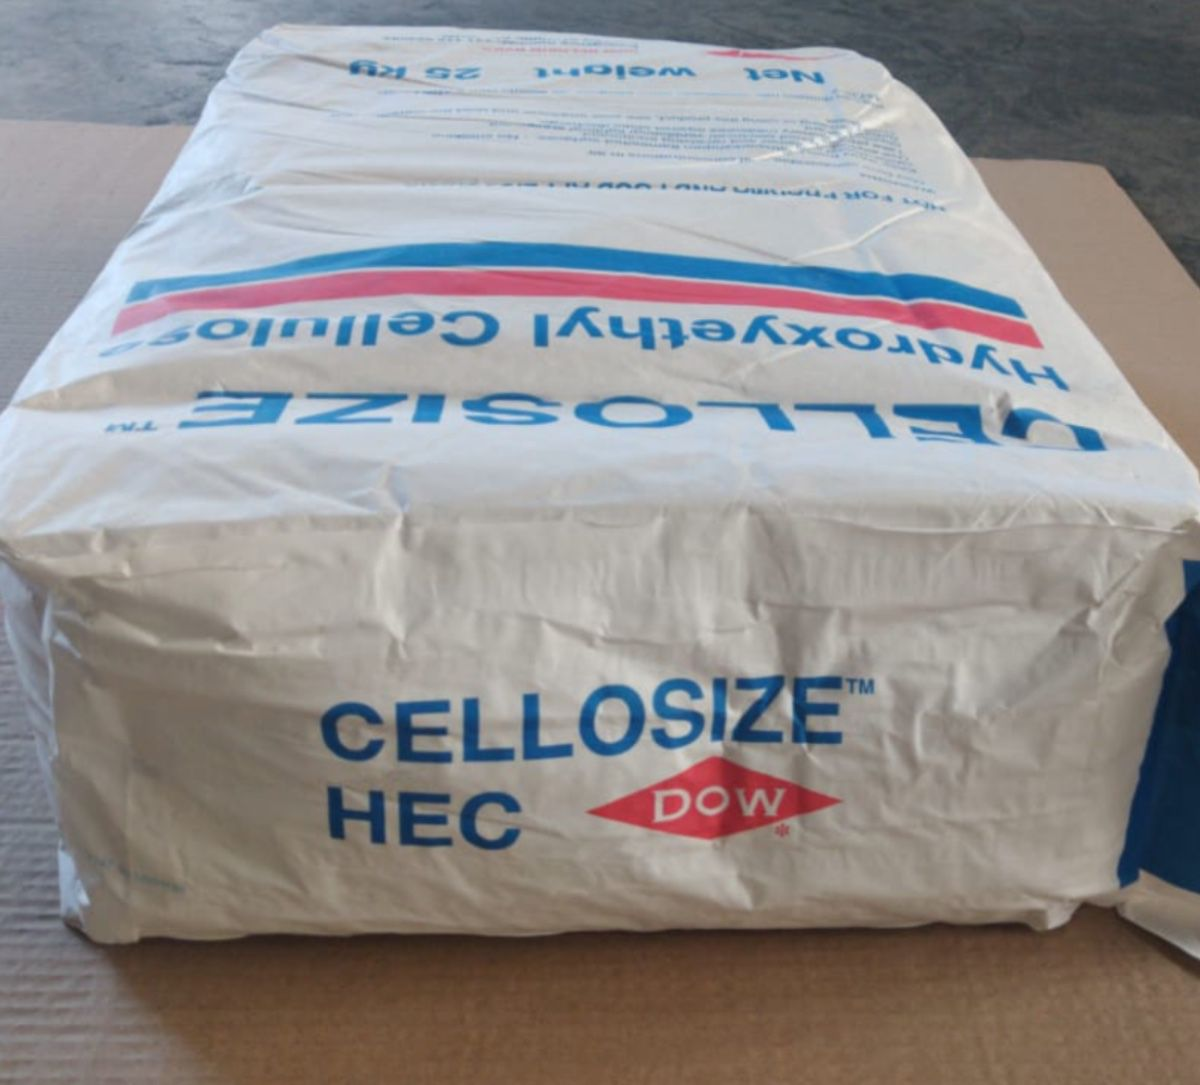 Espessante Cellosize QP 100 Dow Substituto Carbopol 940 10kg